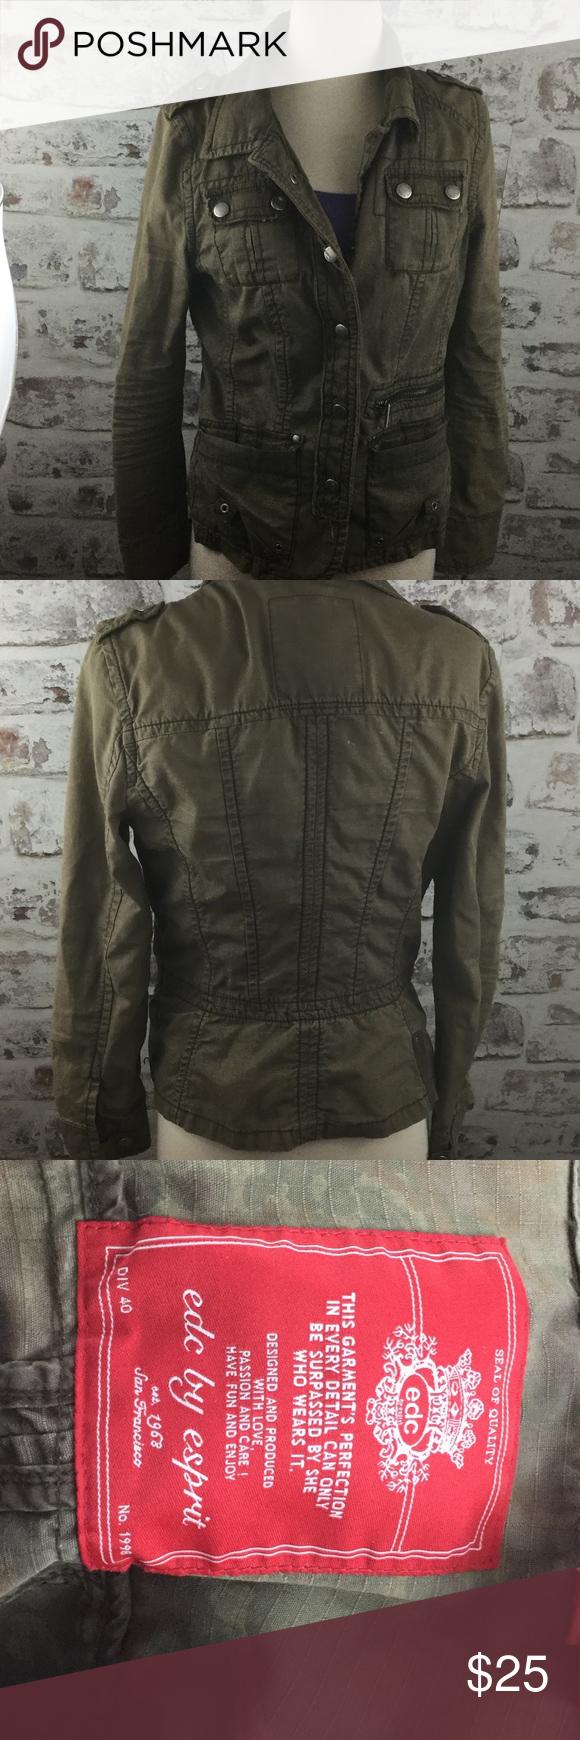 Army Jacket From Espirit Army Jacket Jackets Clothes Design [ 1740 x 580 Pixel ]